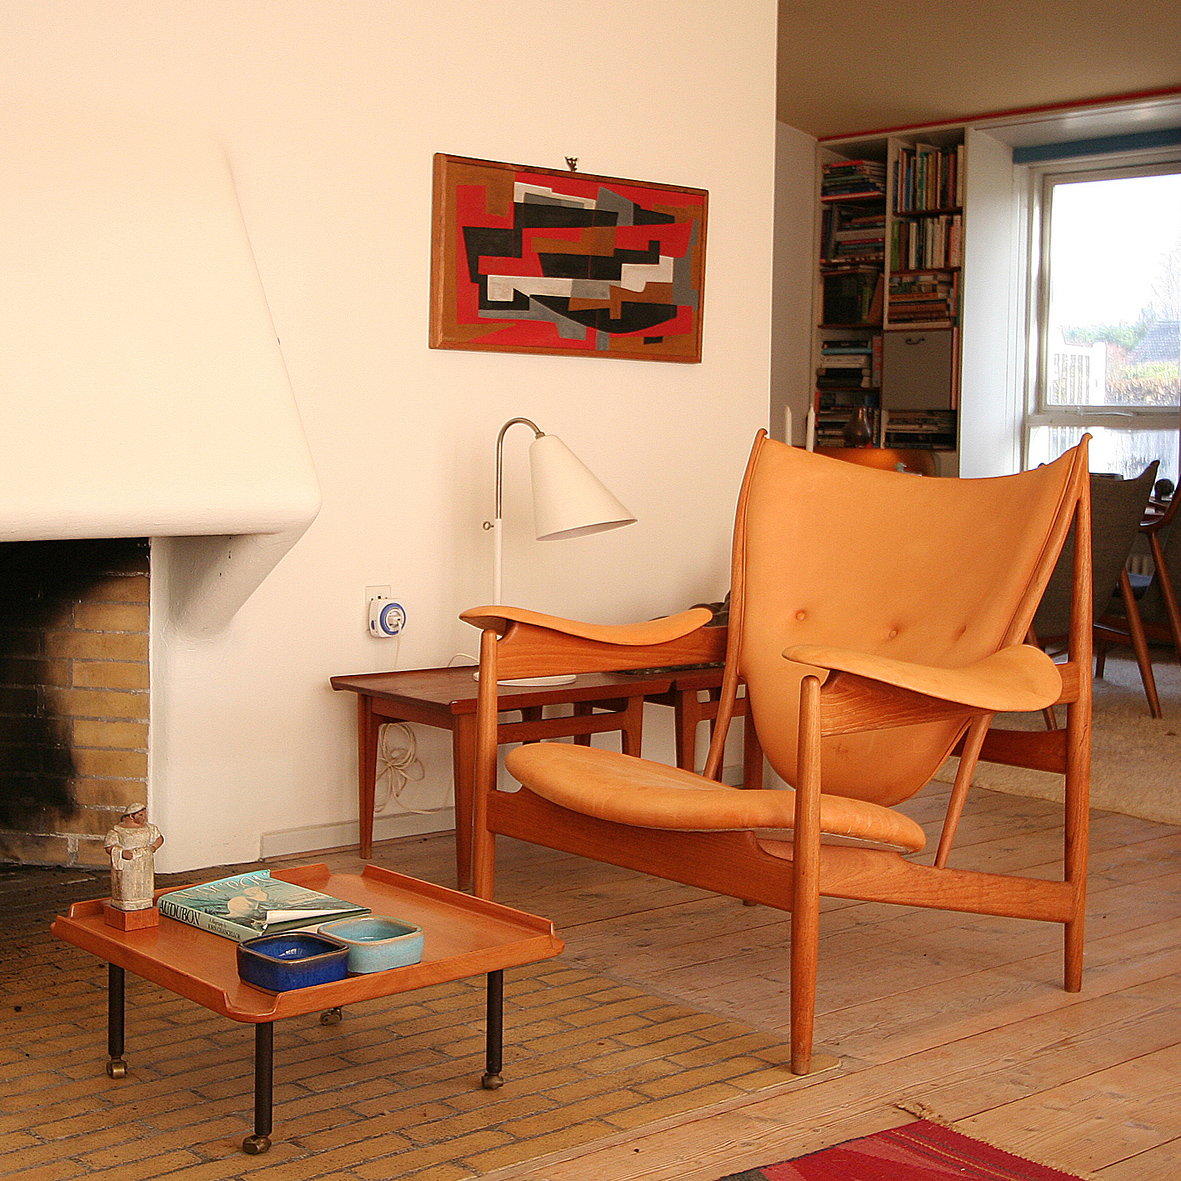 chieftains chair at the house of Finn Juhl.jpg